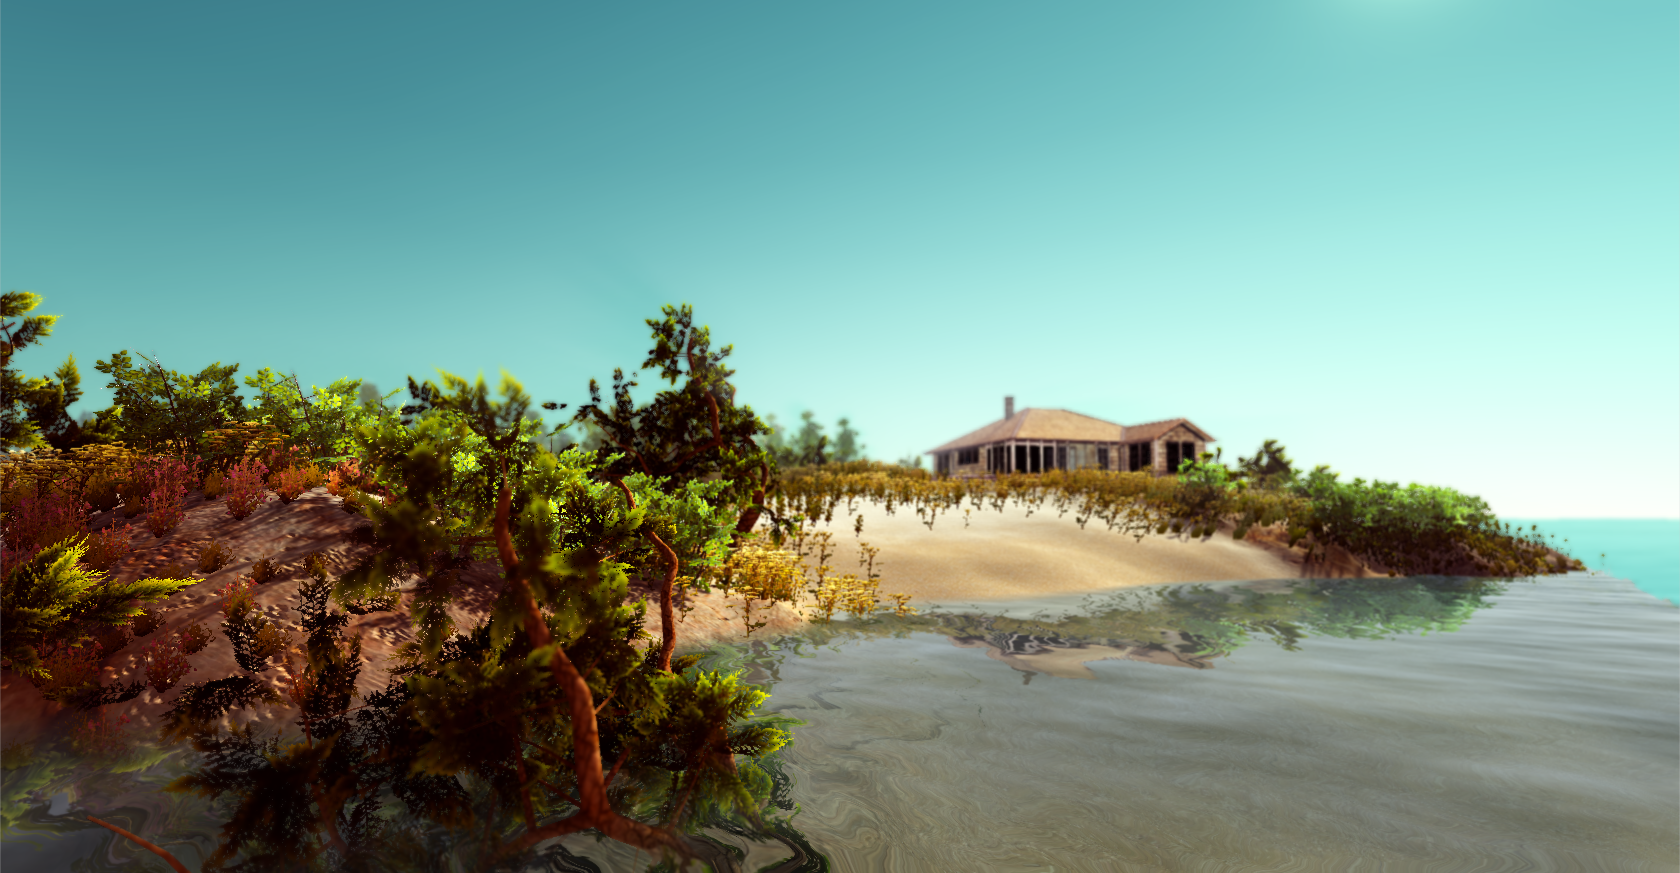 Rock island - Terrain